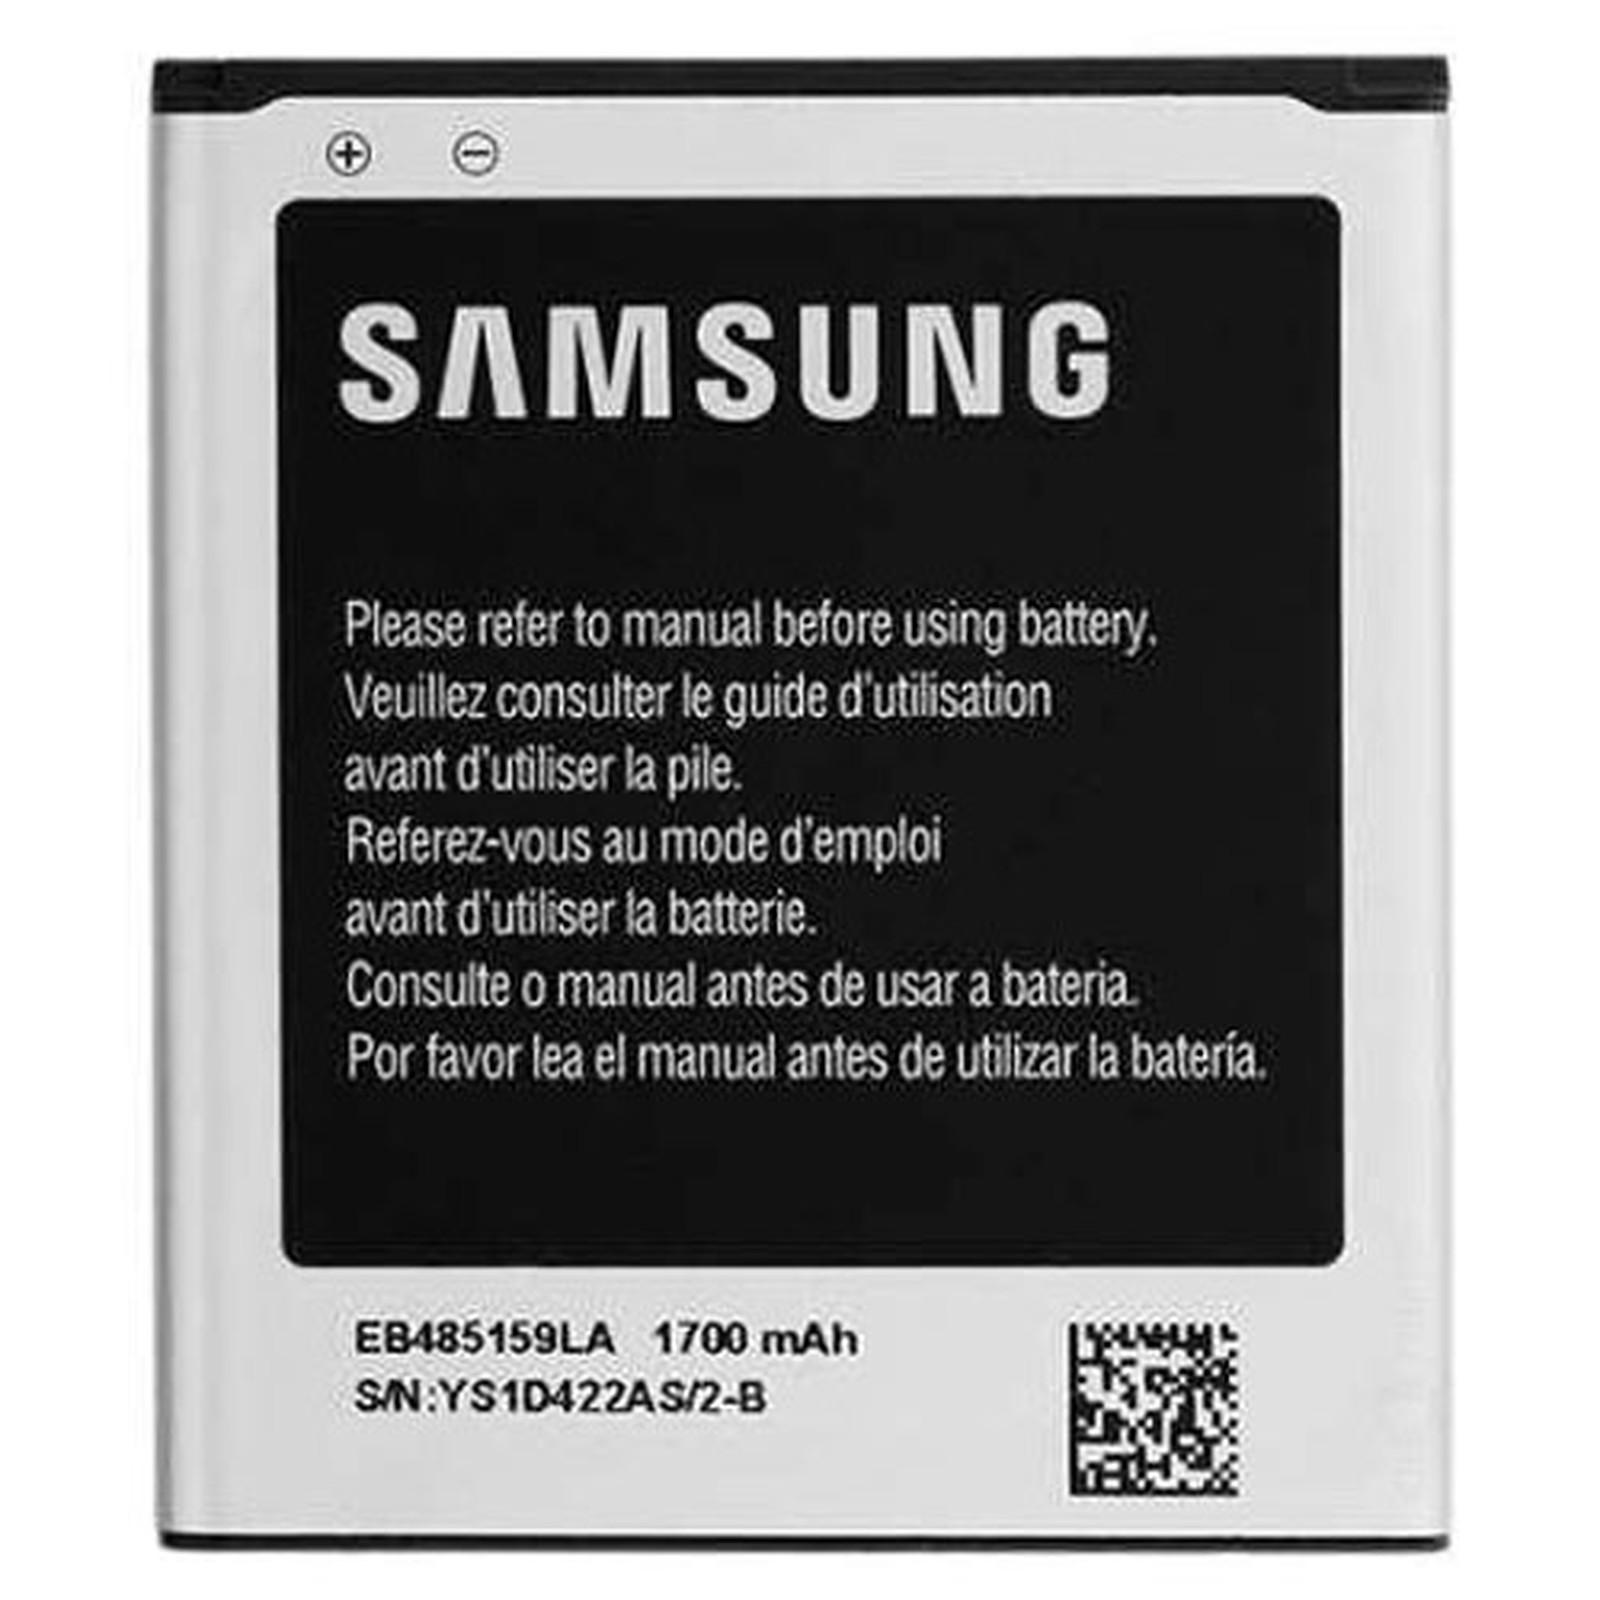 Samsung Batterie EB485159LU